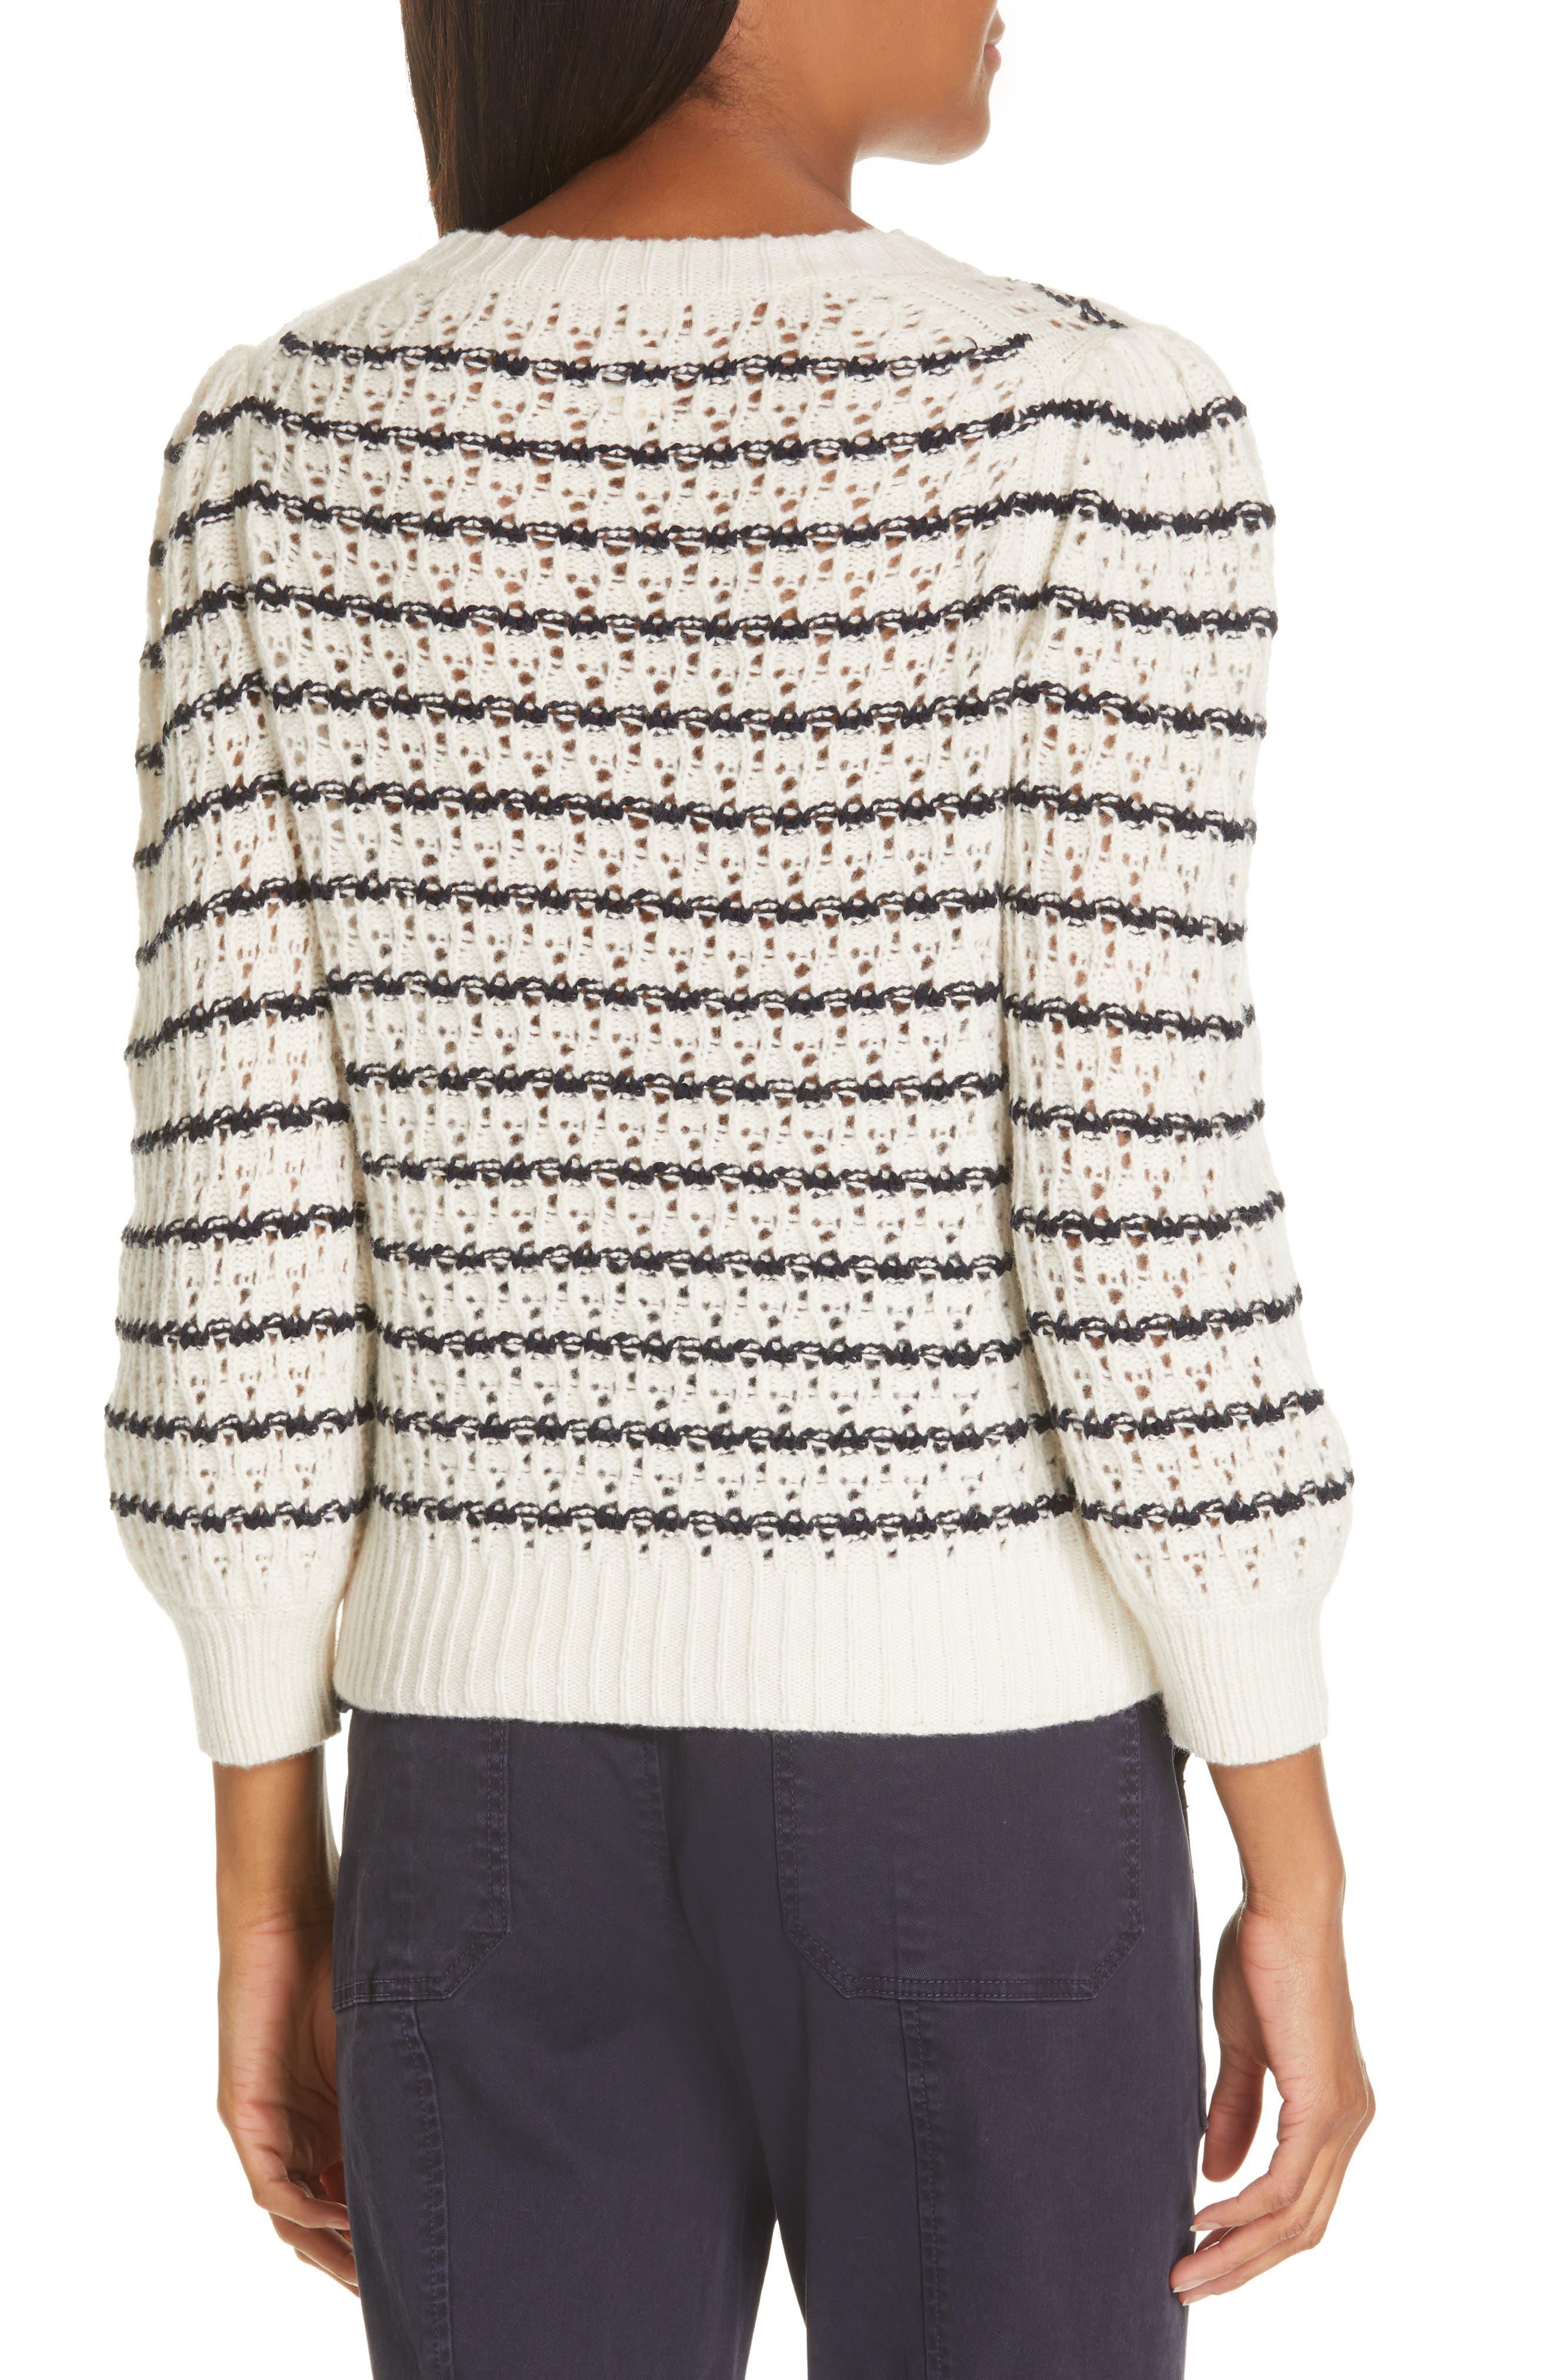 LA VIE REBECCA TAYLOR,                             Stripe Pointelle Sweater,                             Alternate thumbnail 2, color,                             ECRU/ MIDNIGHT NAVY